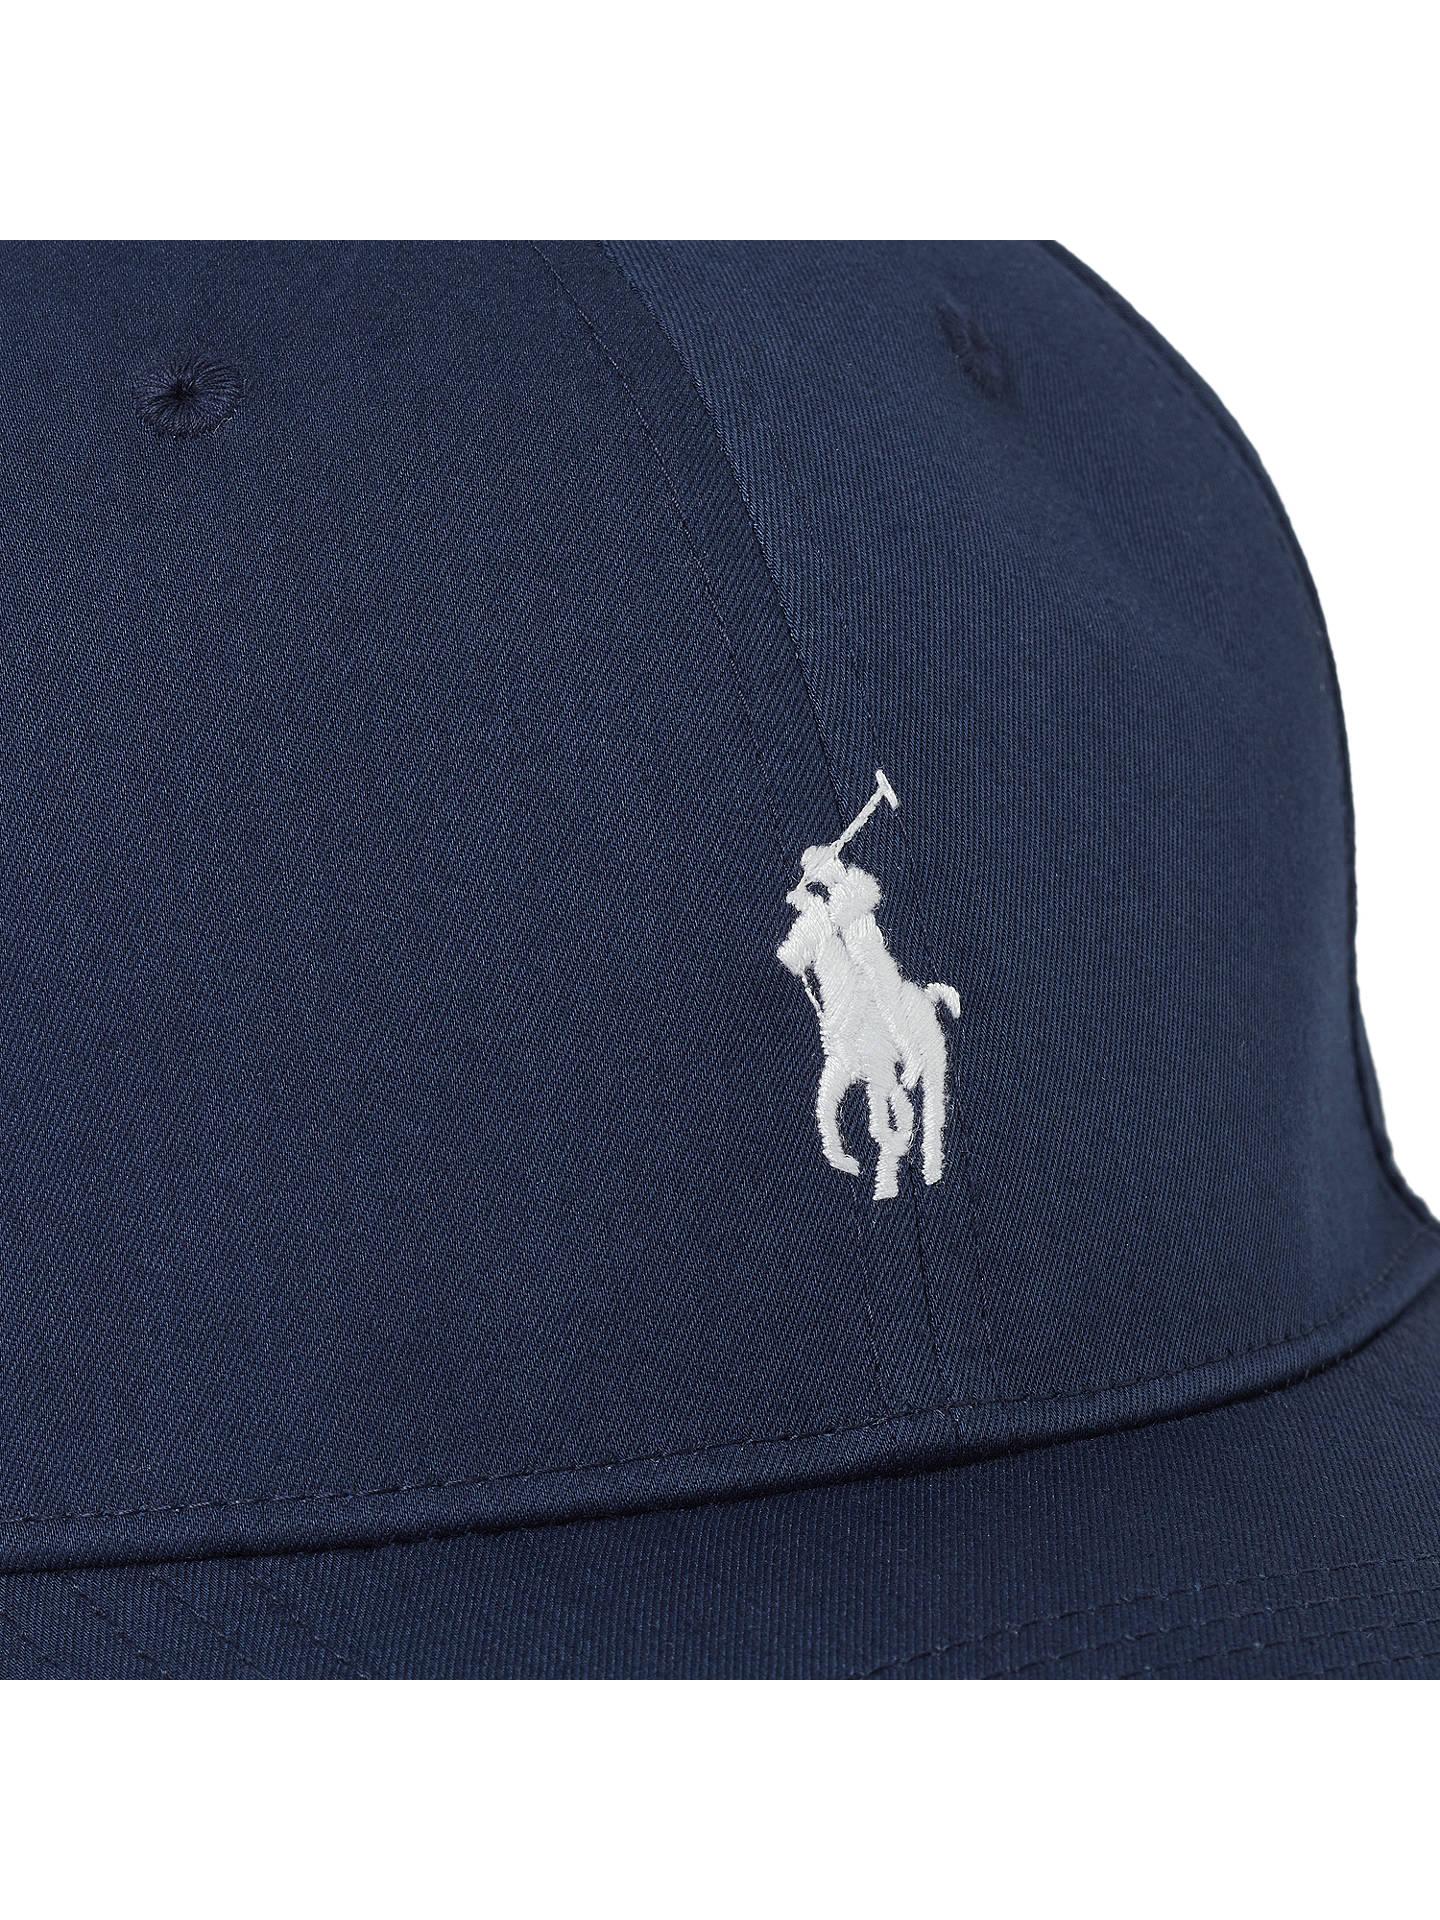 ... BuyPolo Golf by Ralph Lauren Fairway Cap a76afb39cf81